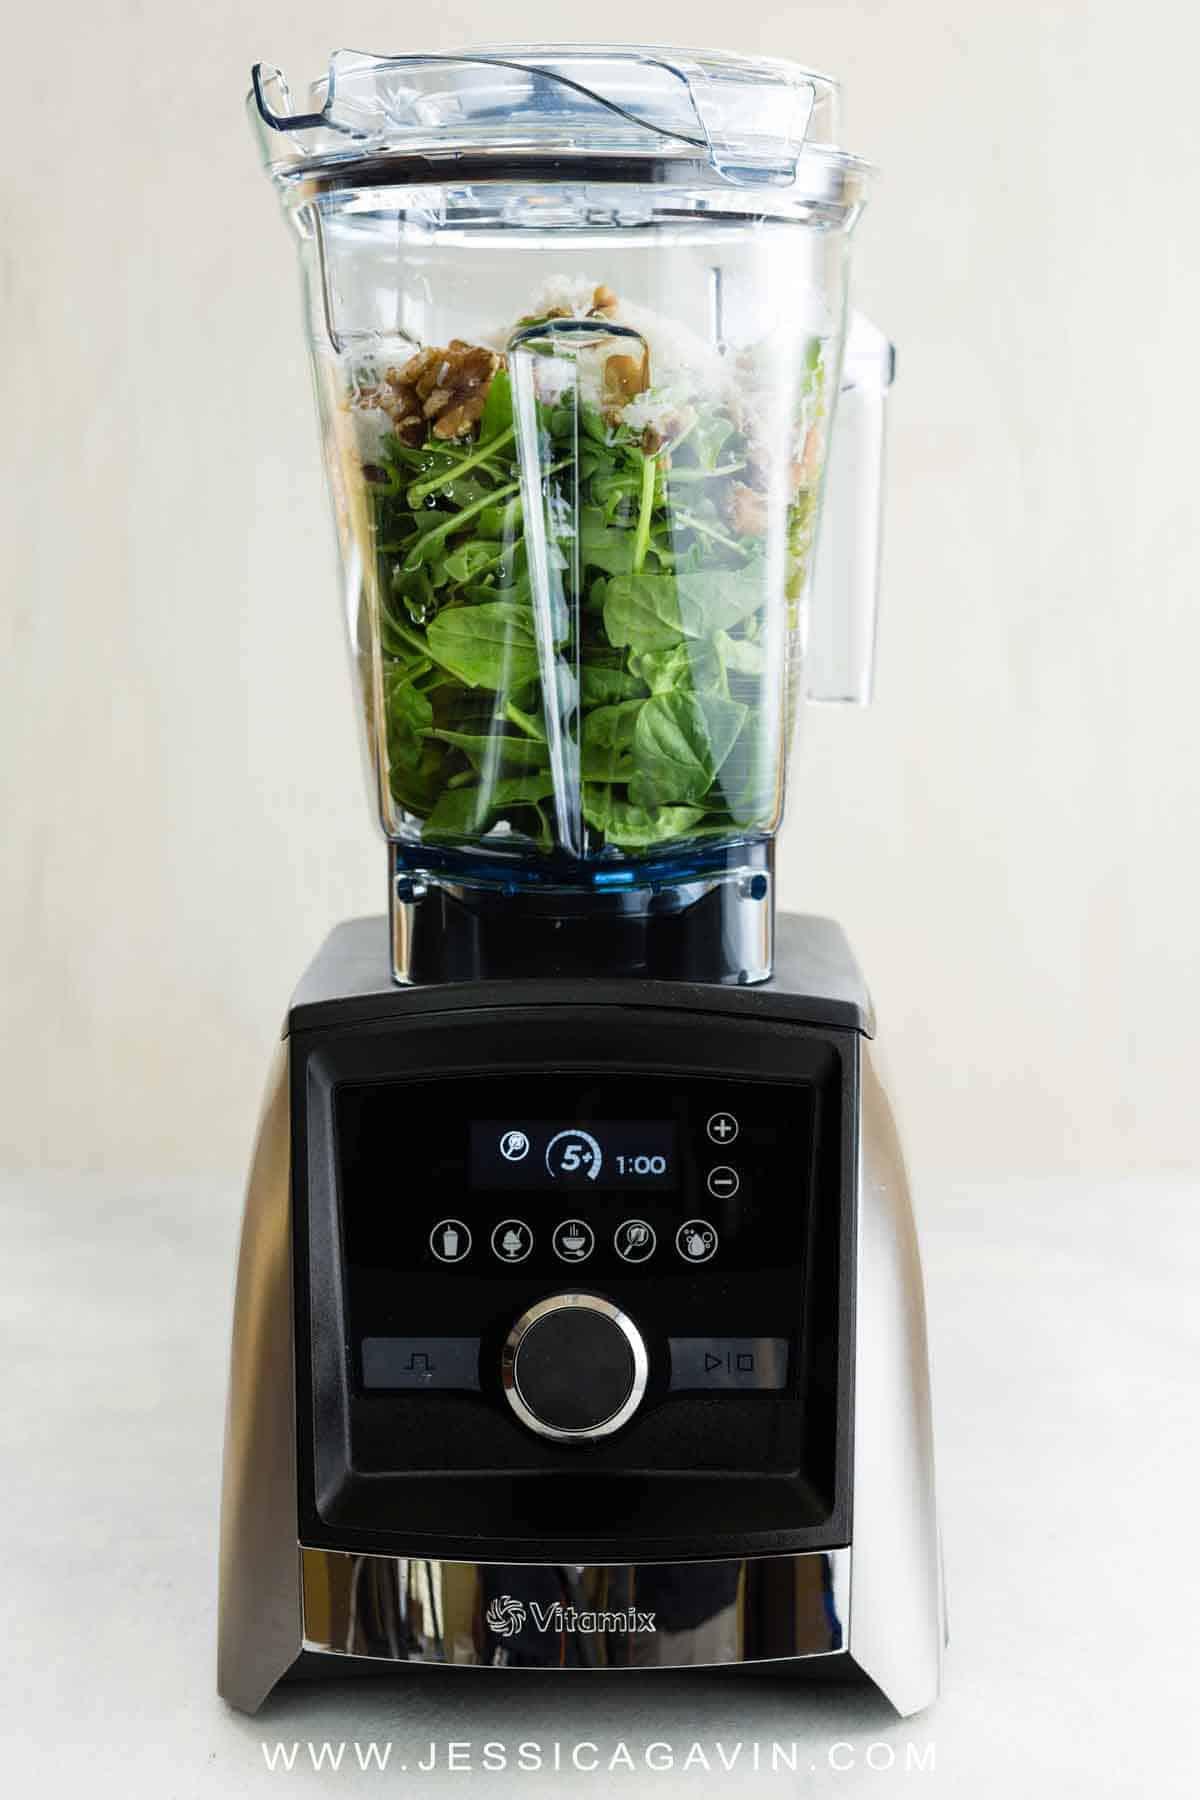 Kitchen Blender Uses and Tips - Jessica Gavin